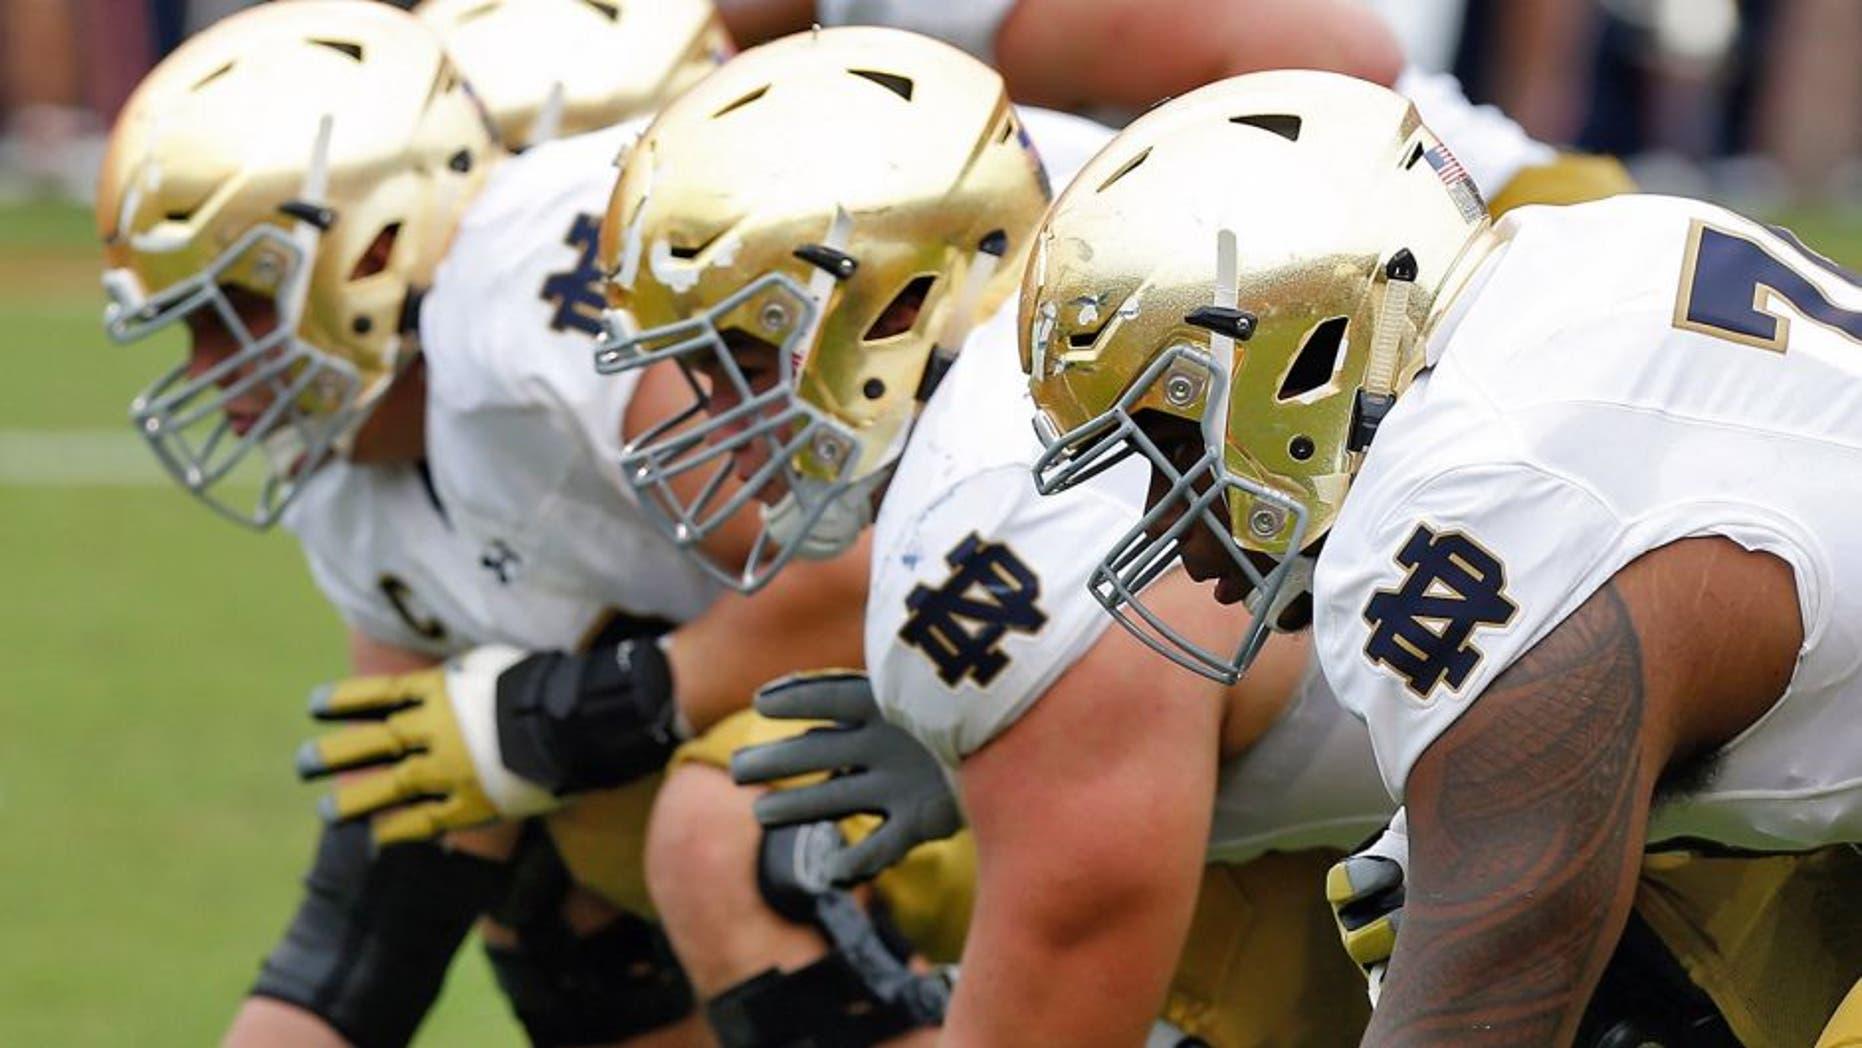 Sep 12, 2015; Charlottesville, VA, USA; The Notre Dame Fighting Irish offensive line lines up against the Virginia Cavaliers at Scott Stadium. Mandatory Credit: Geoff Burke-USA TODAY Sports